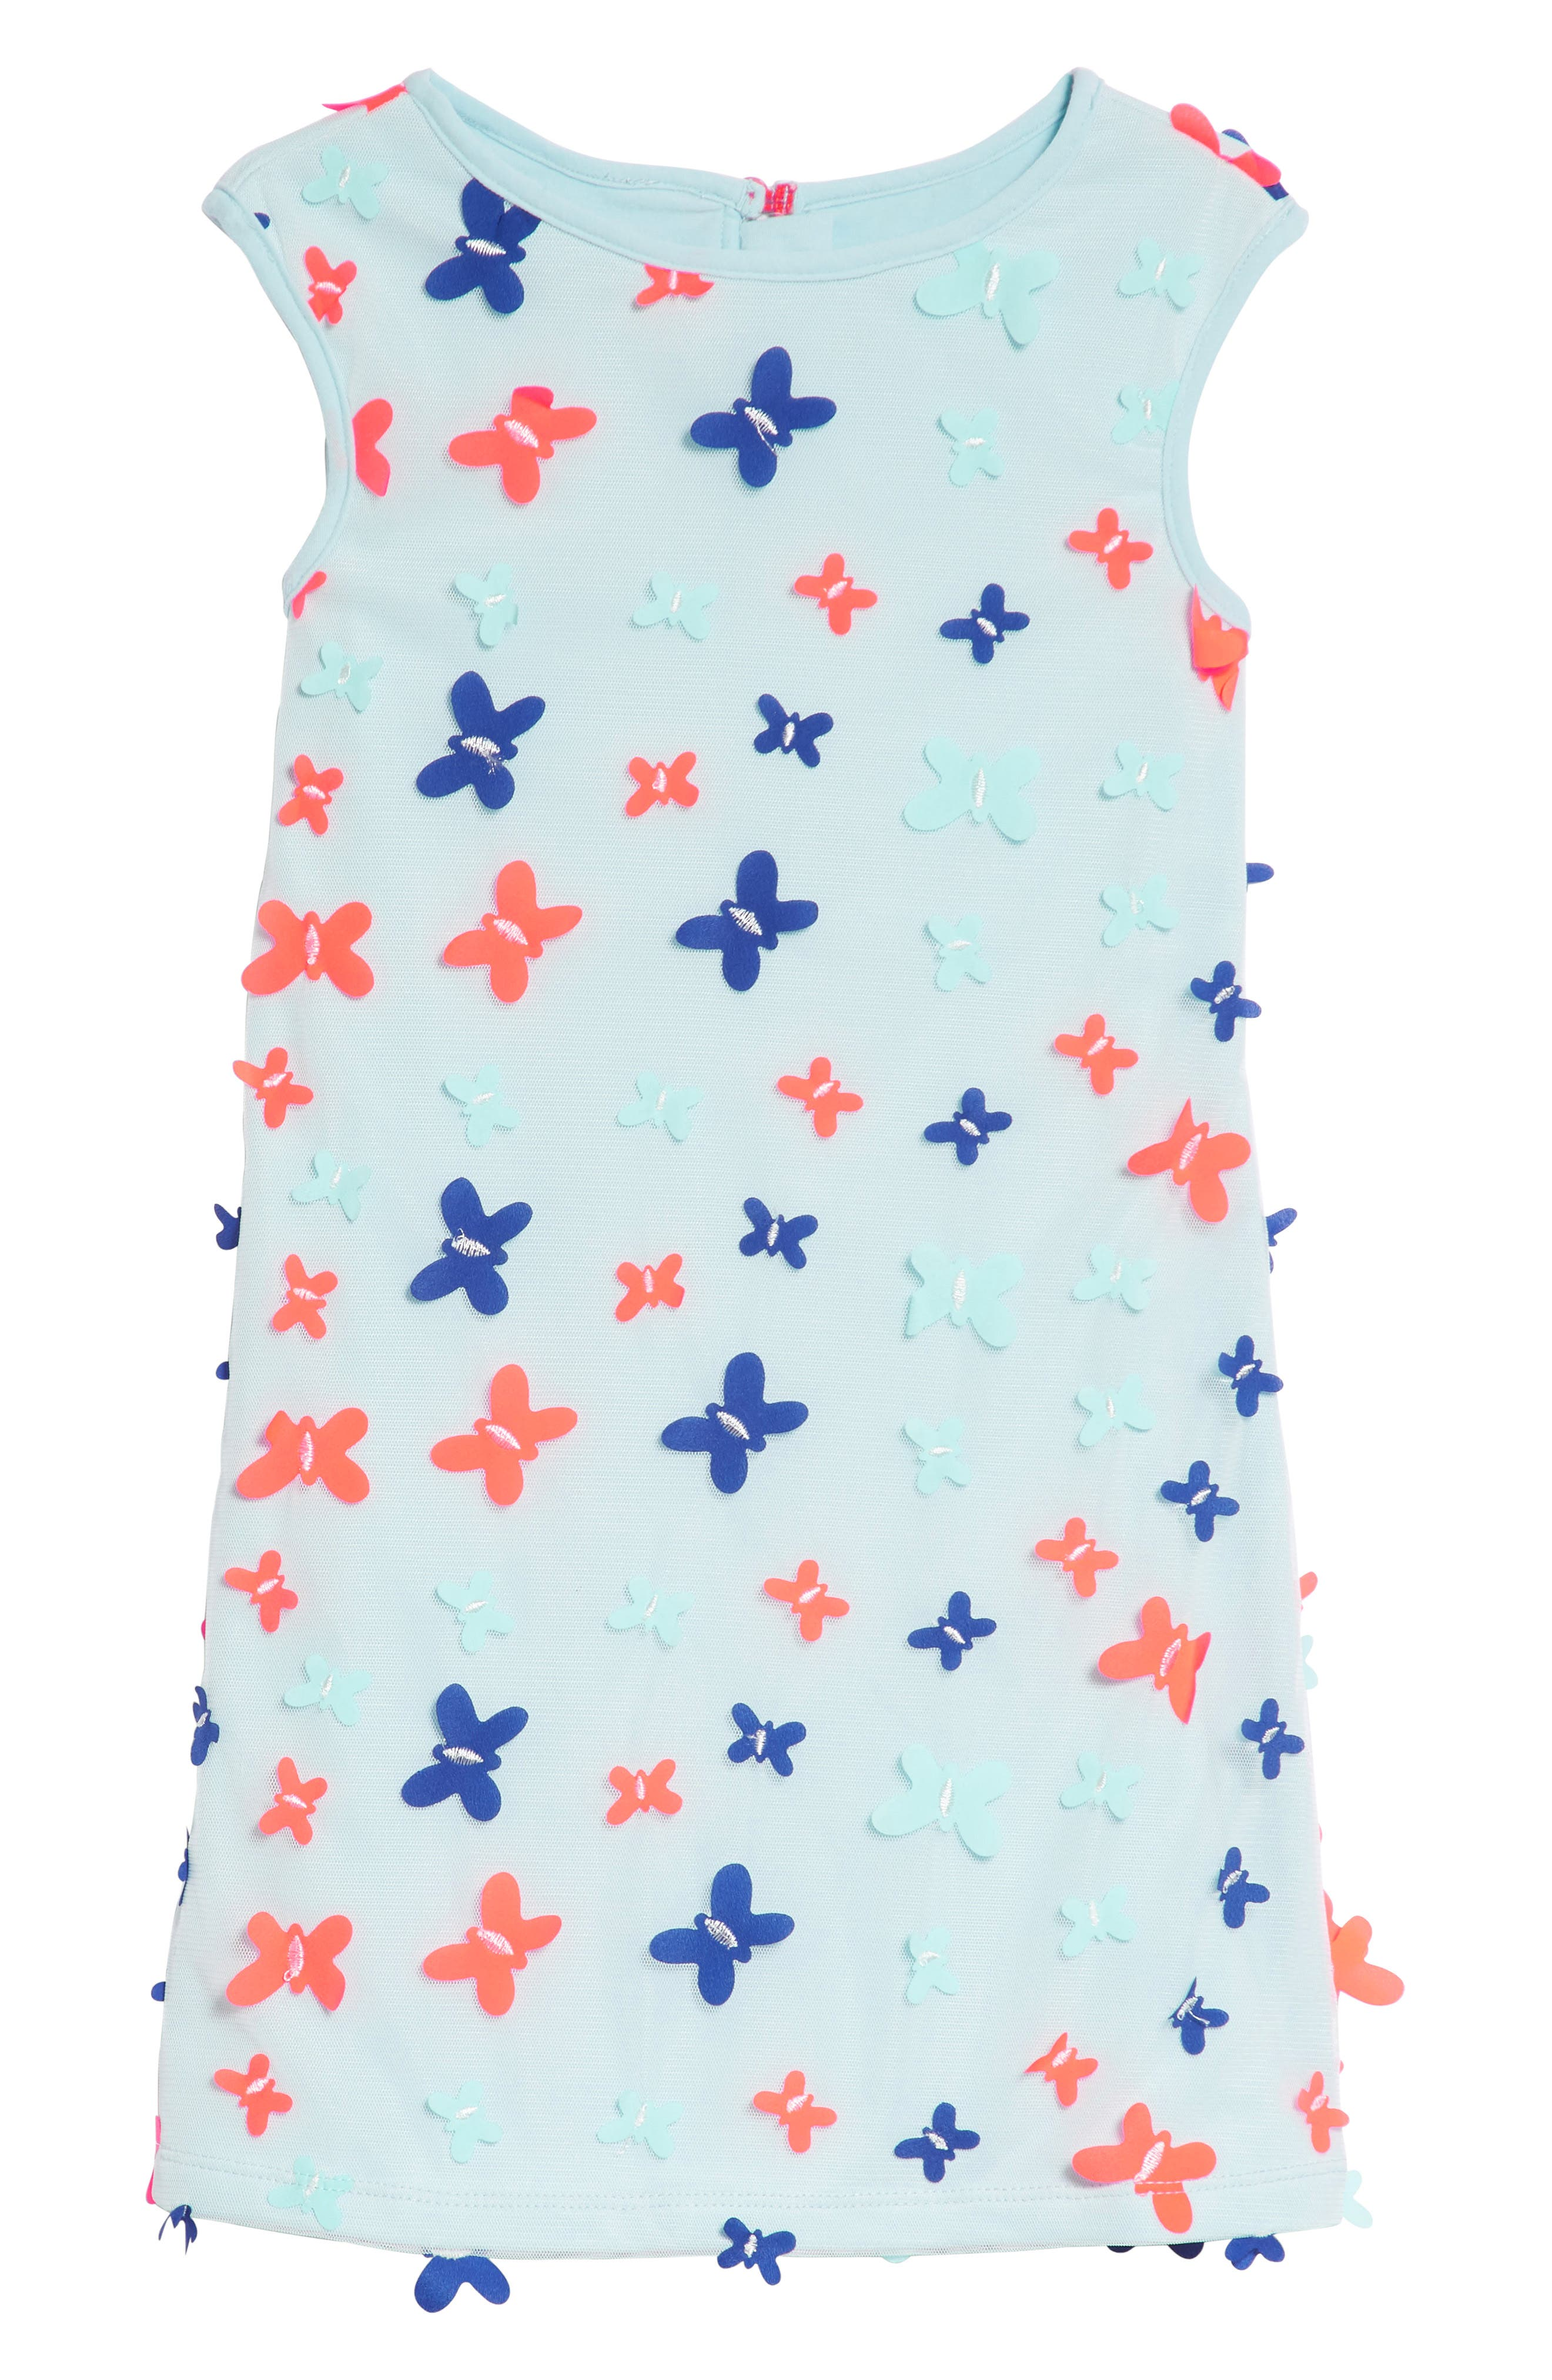 3D Butterfly Embellished Mesh Dress,                         Main,                         color, Blue